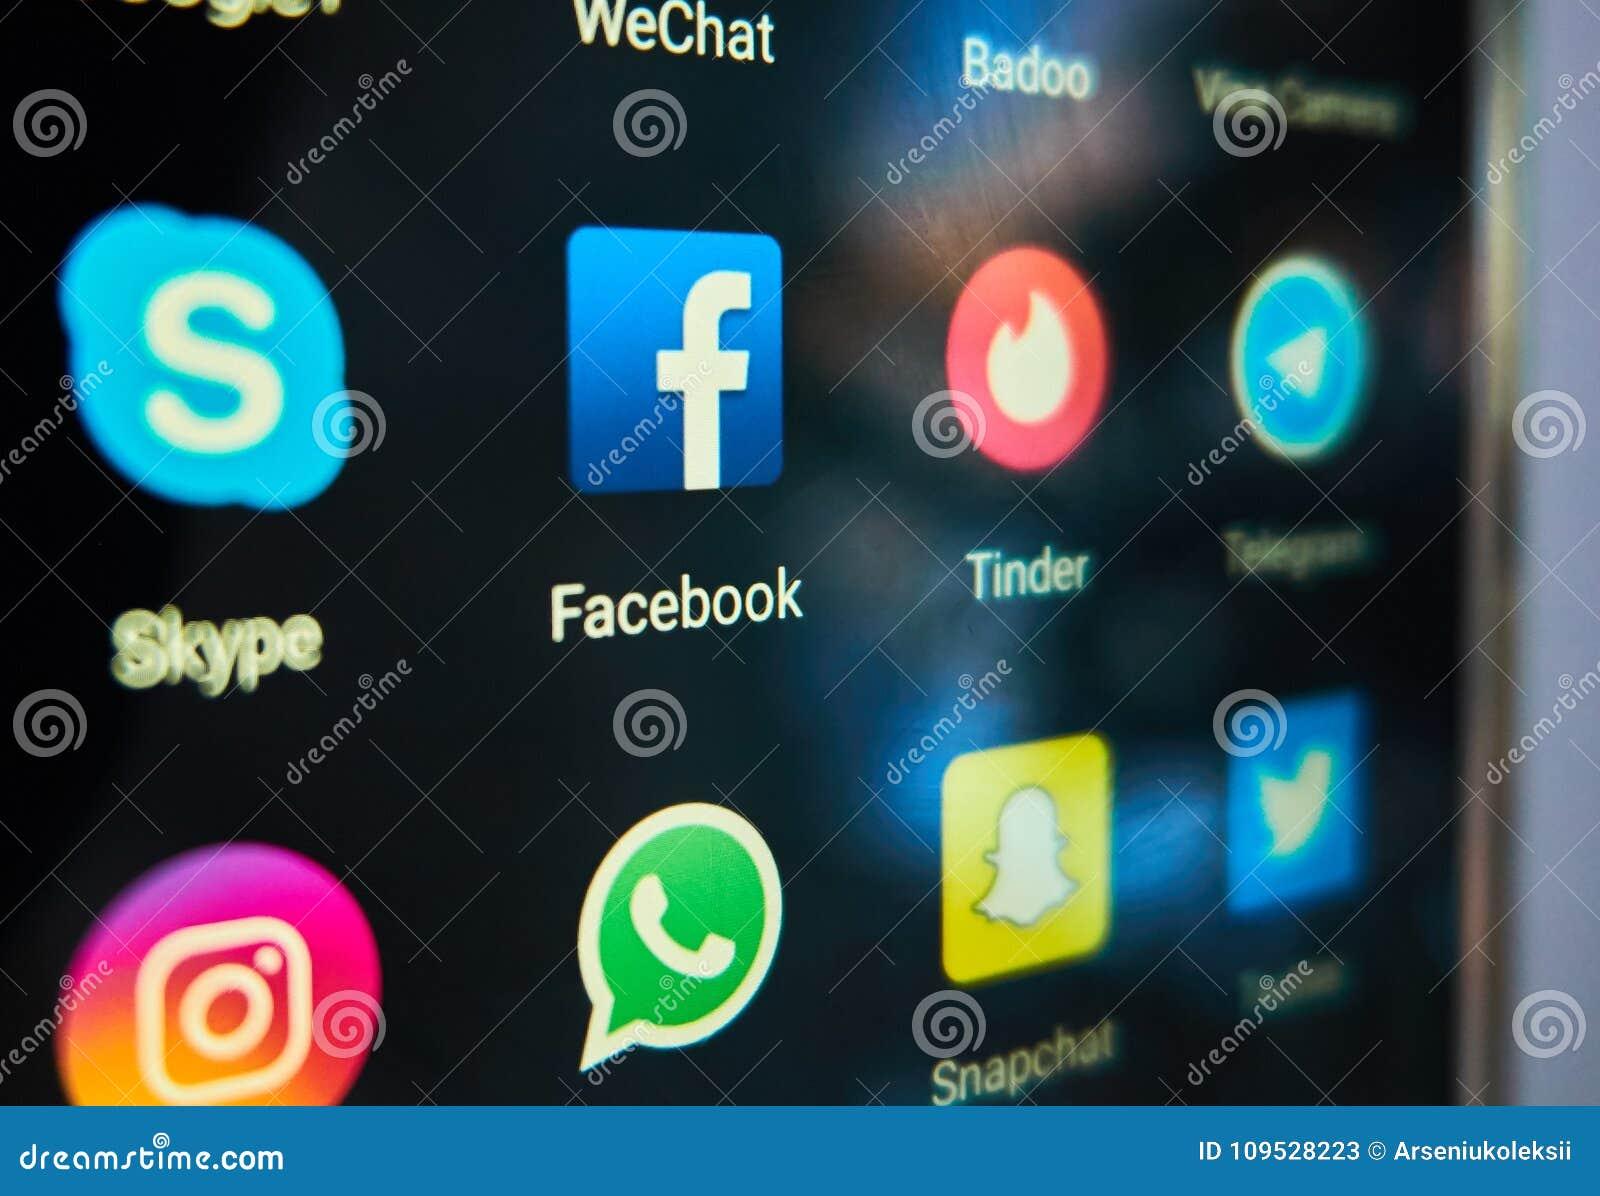 most popular dating app ukraine dating services website